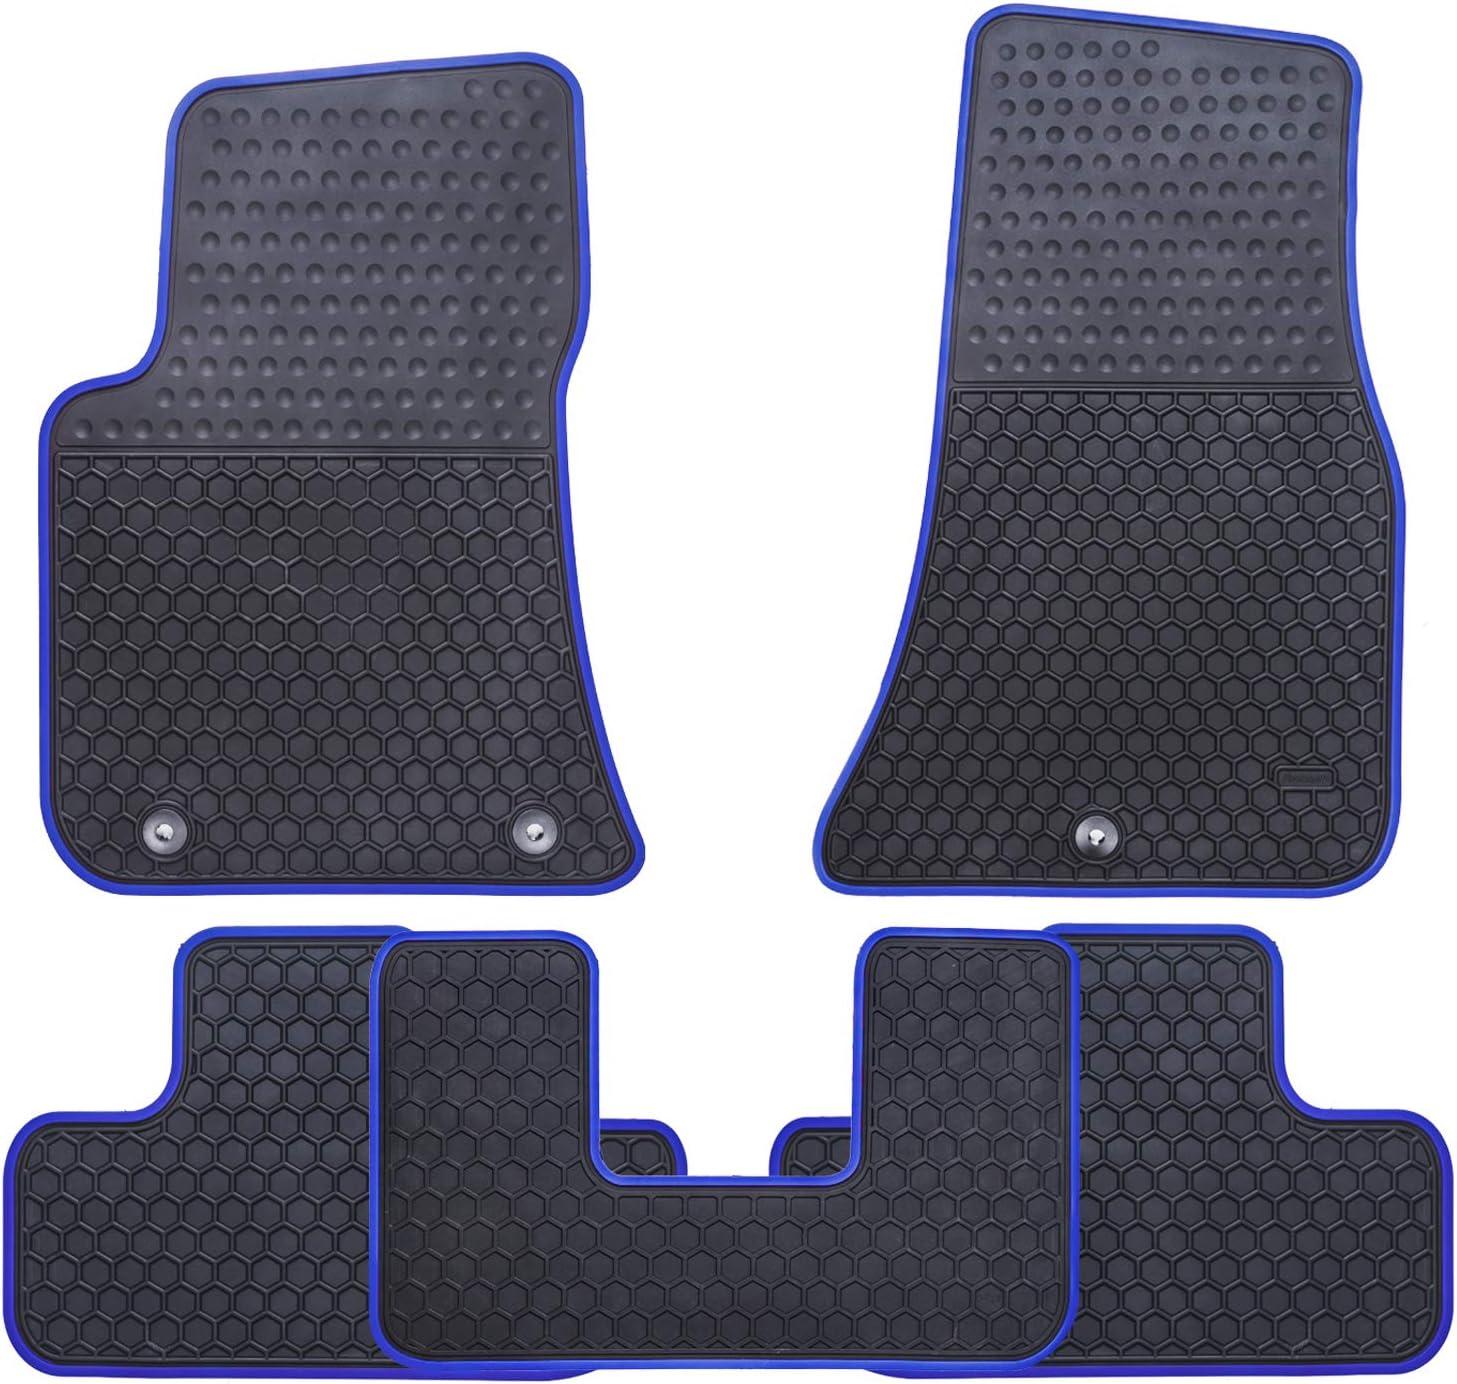 Ucaskin Car Floor Mats Custom Fit for Dodge Challenger 2016 2017 2018 2019 Odorless Washable Rubber Foot Carpet Heavy Duty Anti-Slip All Weather Protection Car Floor Liner-Blue